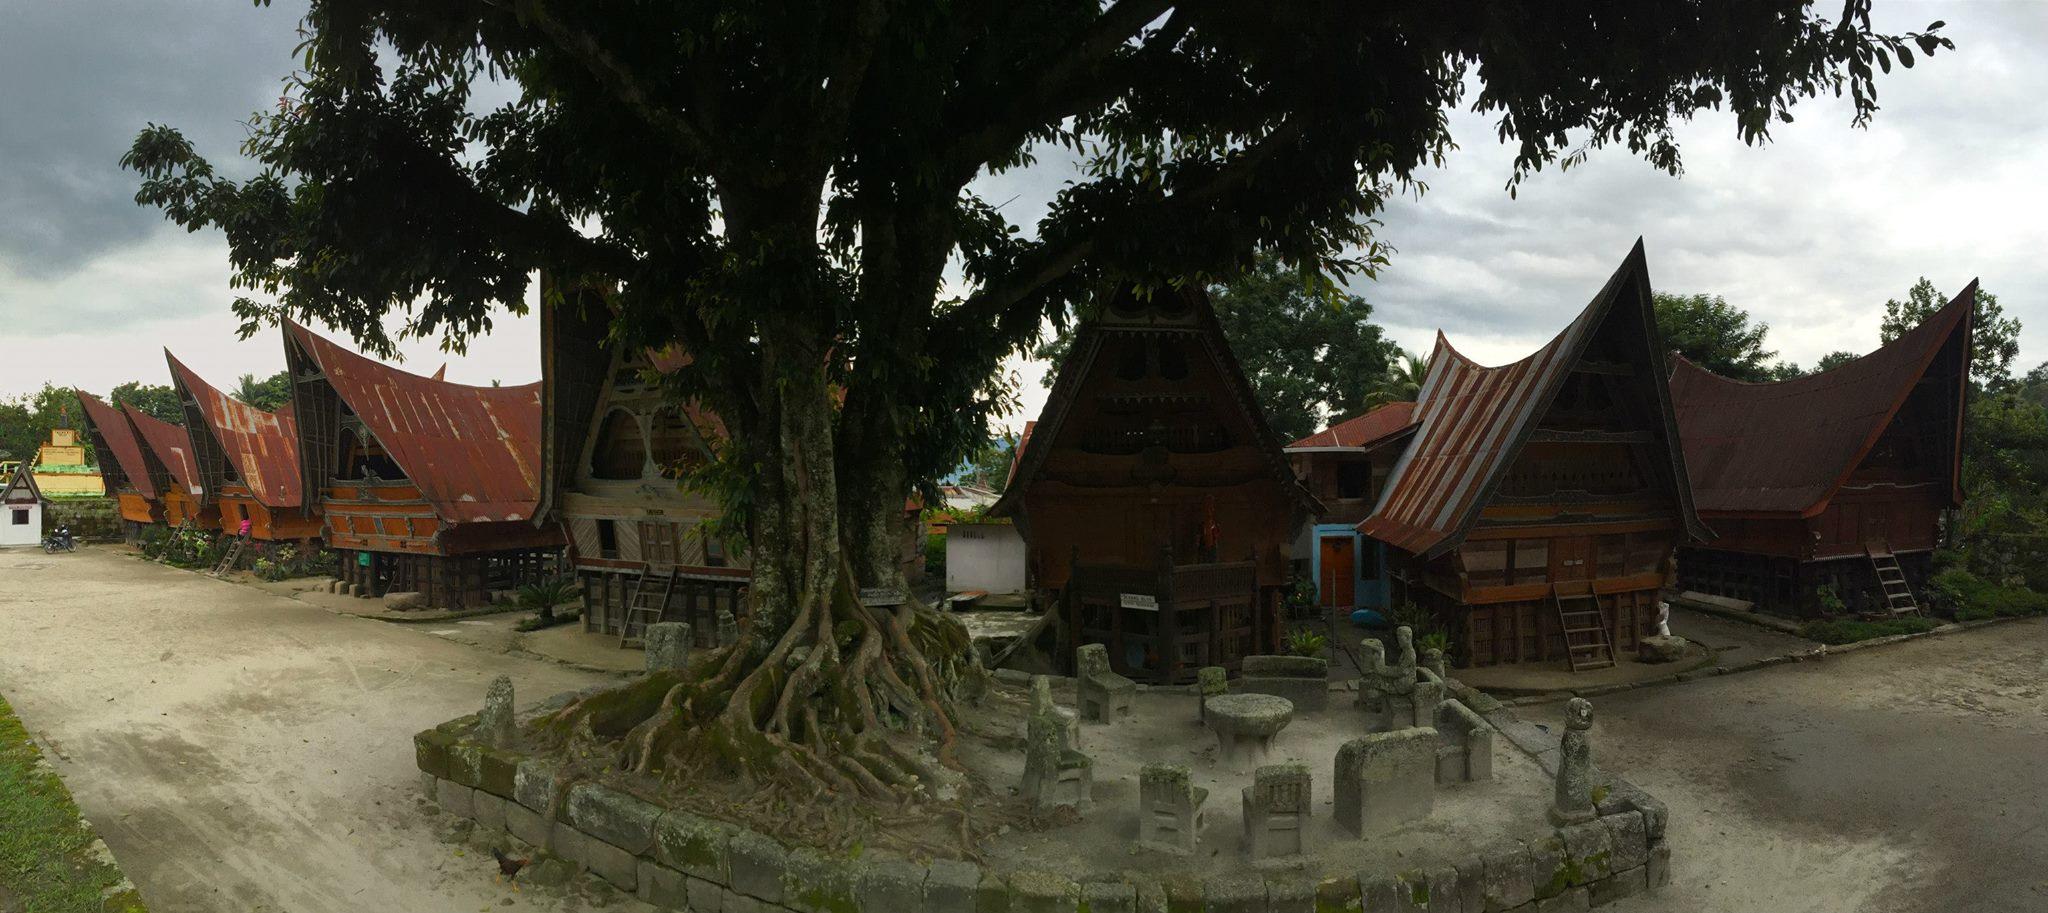 Batak House Lake Toba Indonesia